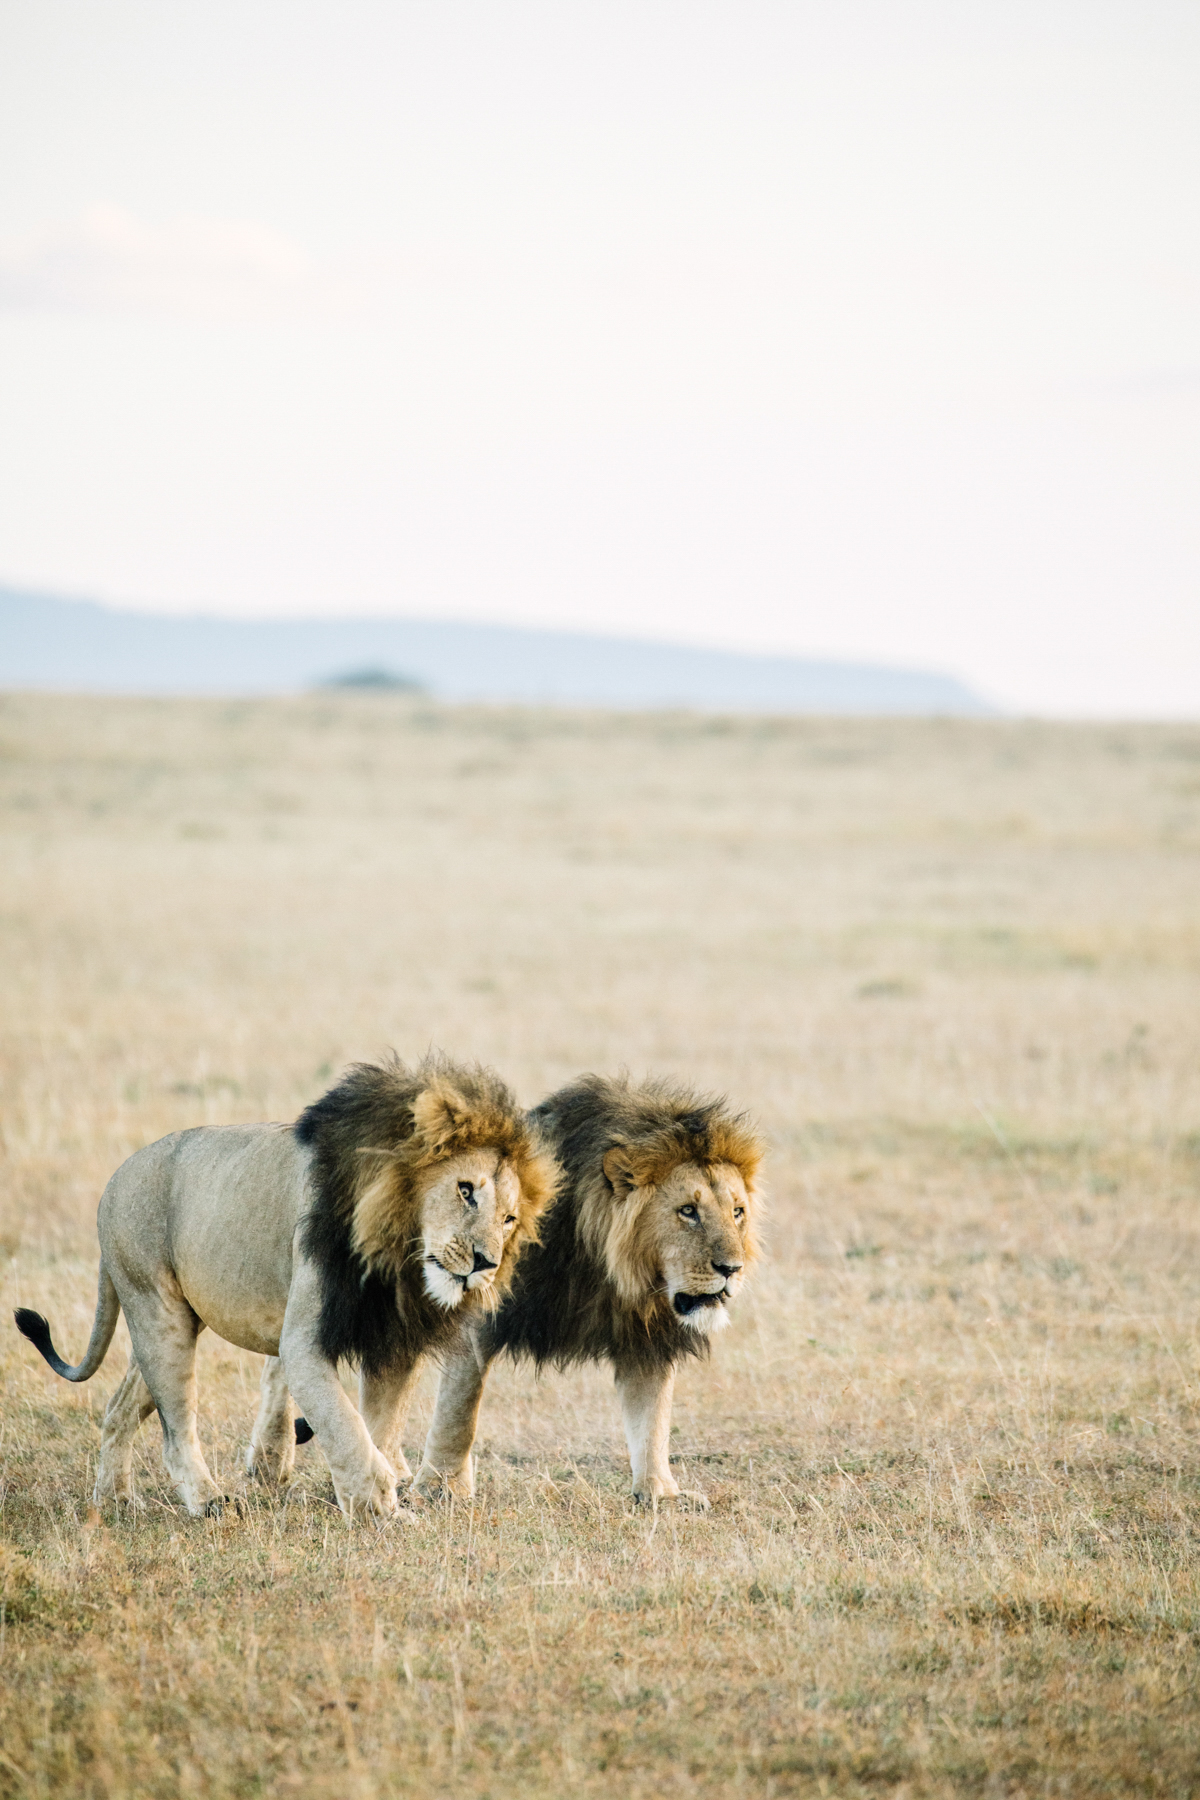 KenyaFeb2019_Safari-232.jpg